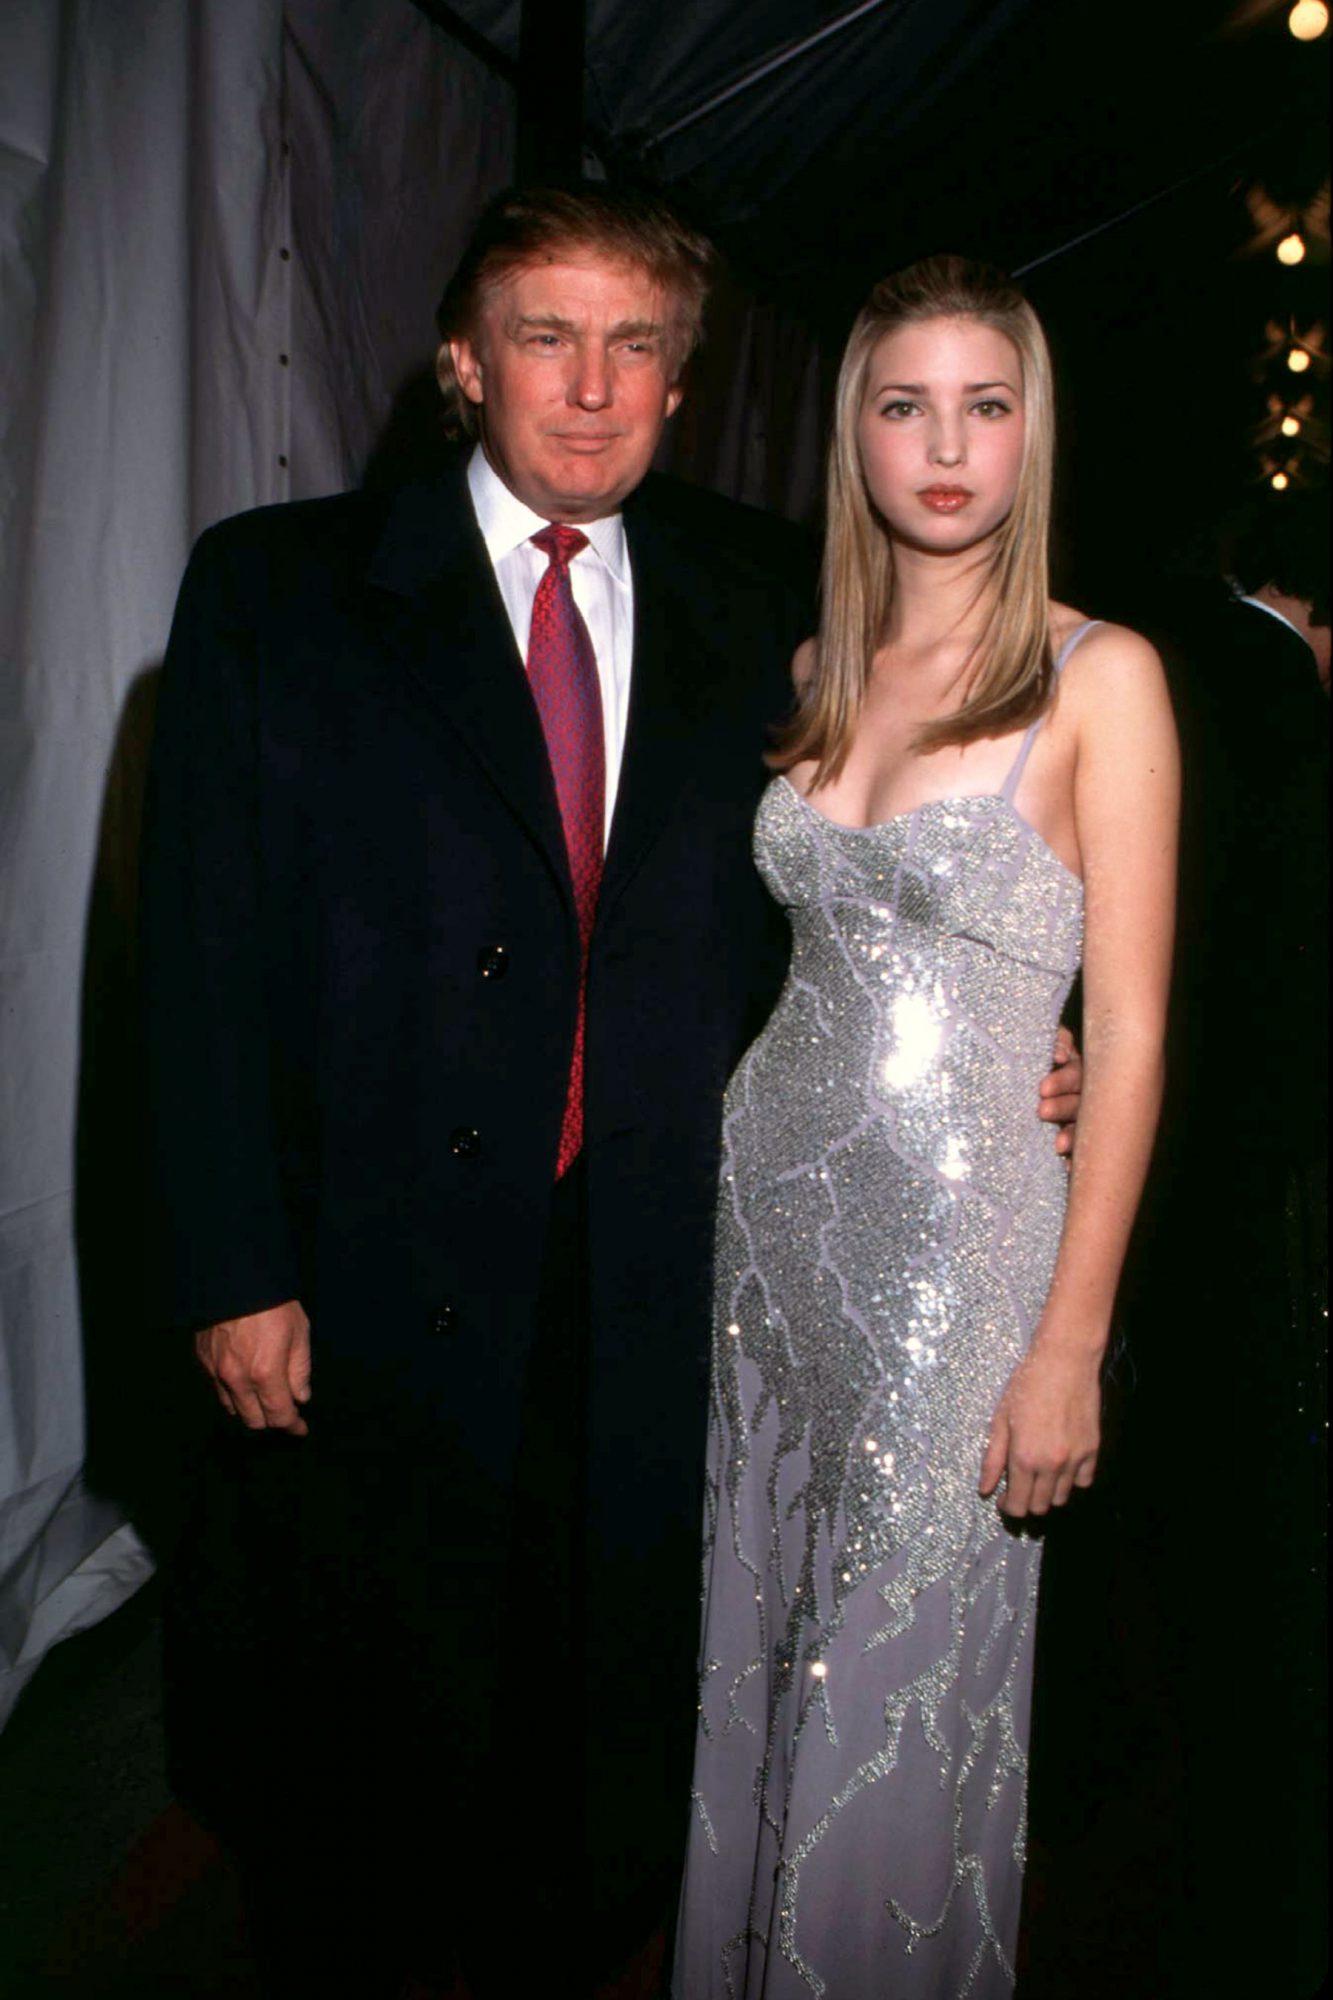 Radio City Music Hall Donald Trump With Daughter Ivanka Trump Backstage At The 4